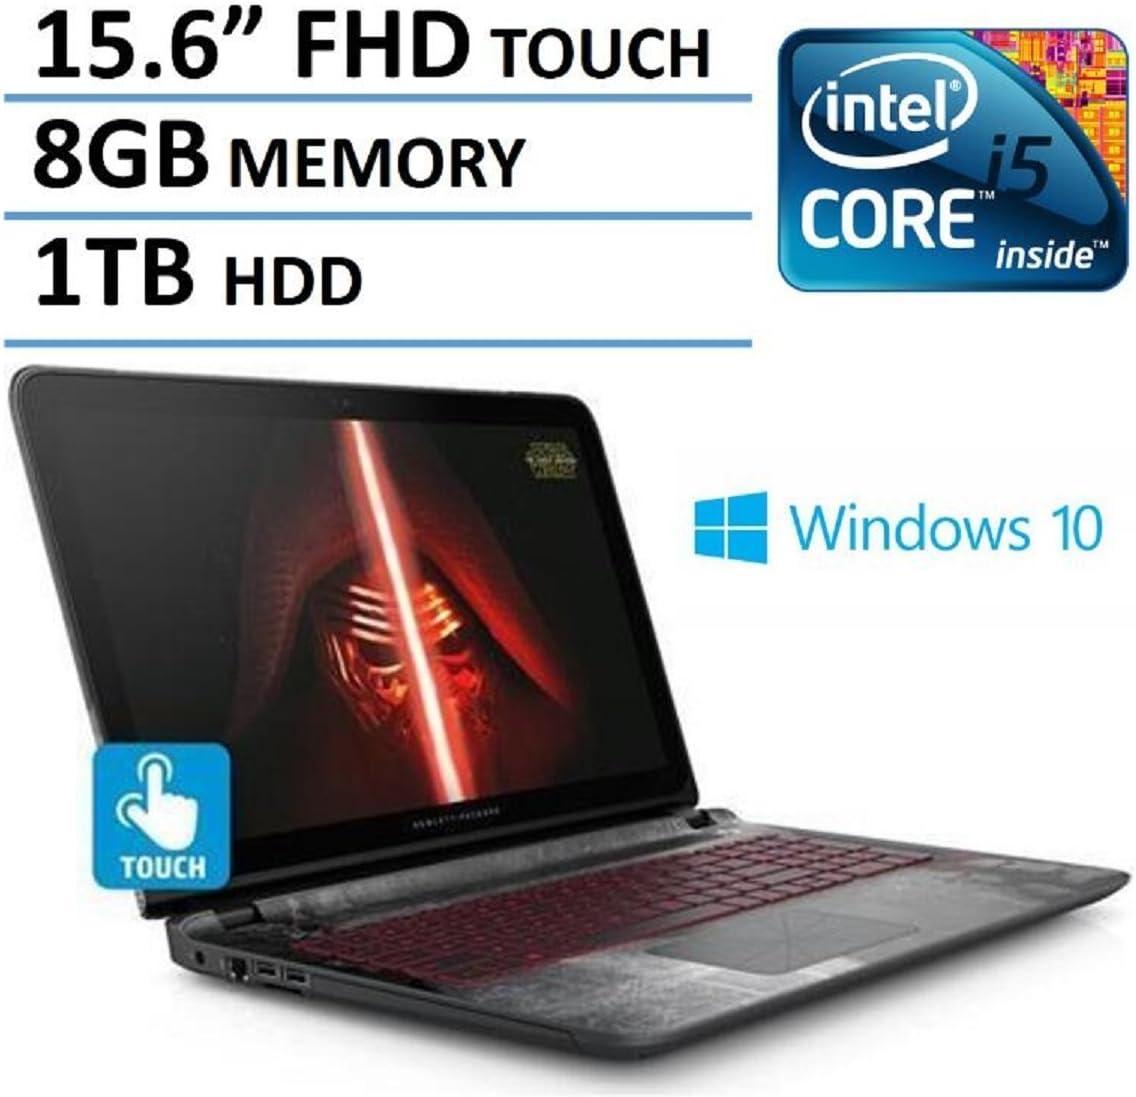 Amazon Com 2016 Hp Star Wars Edition 15 6 Full Hd Ips Touchscreen Gaming Laptop Intel Core I5 6200u Processor Nvidia Geforce 940m Graphics 8gb Ram 1tb Hdd Dvd Rw Backlit Keyboard Windows 10 Computers